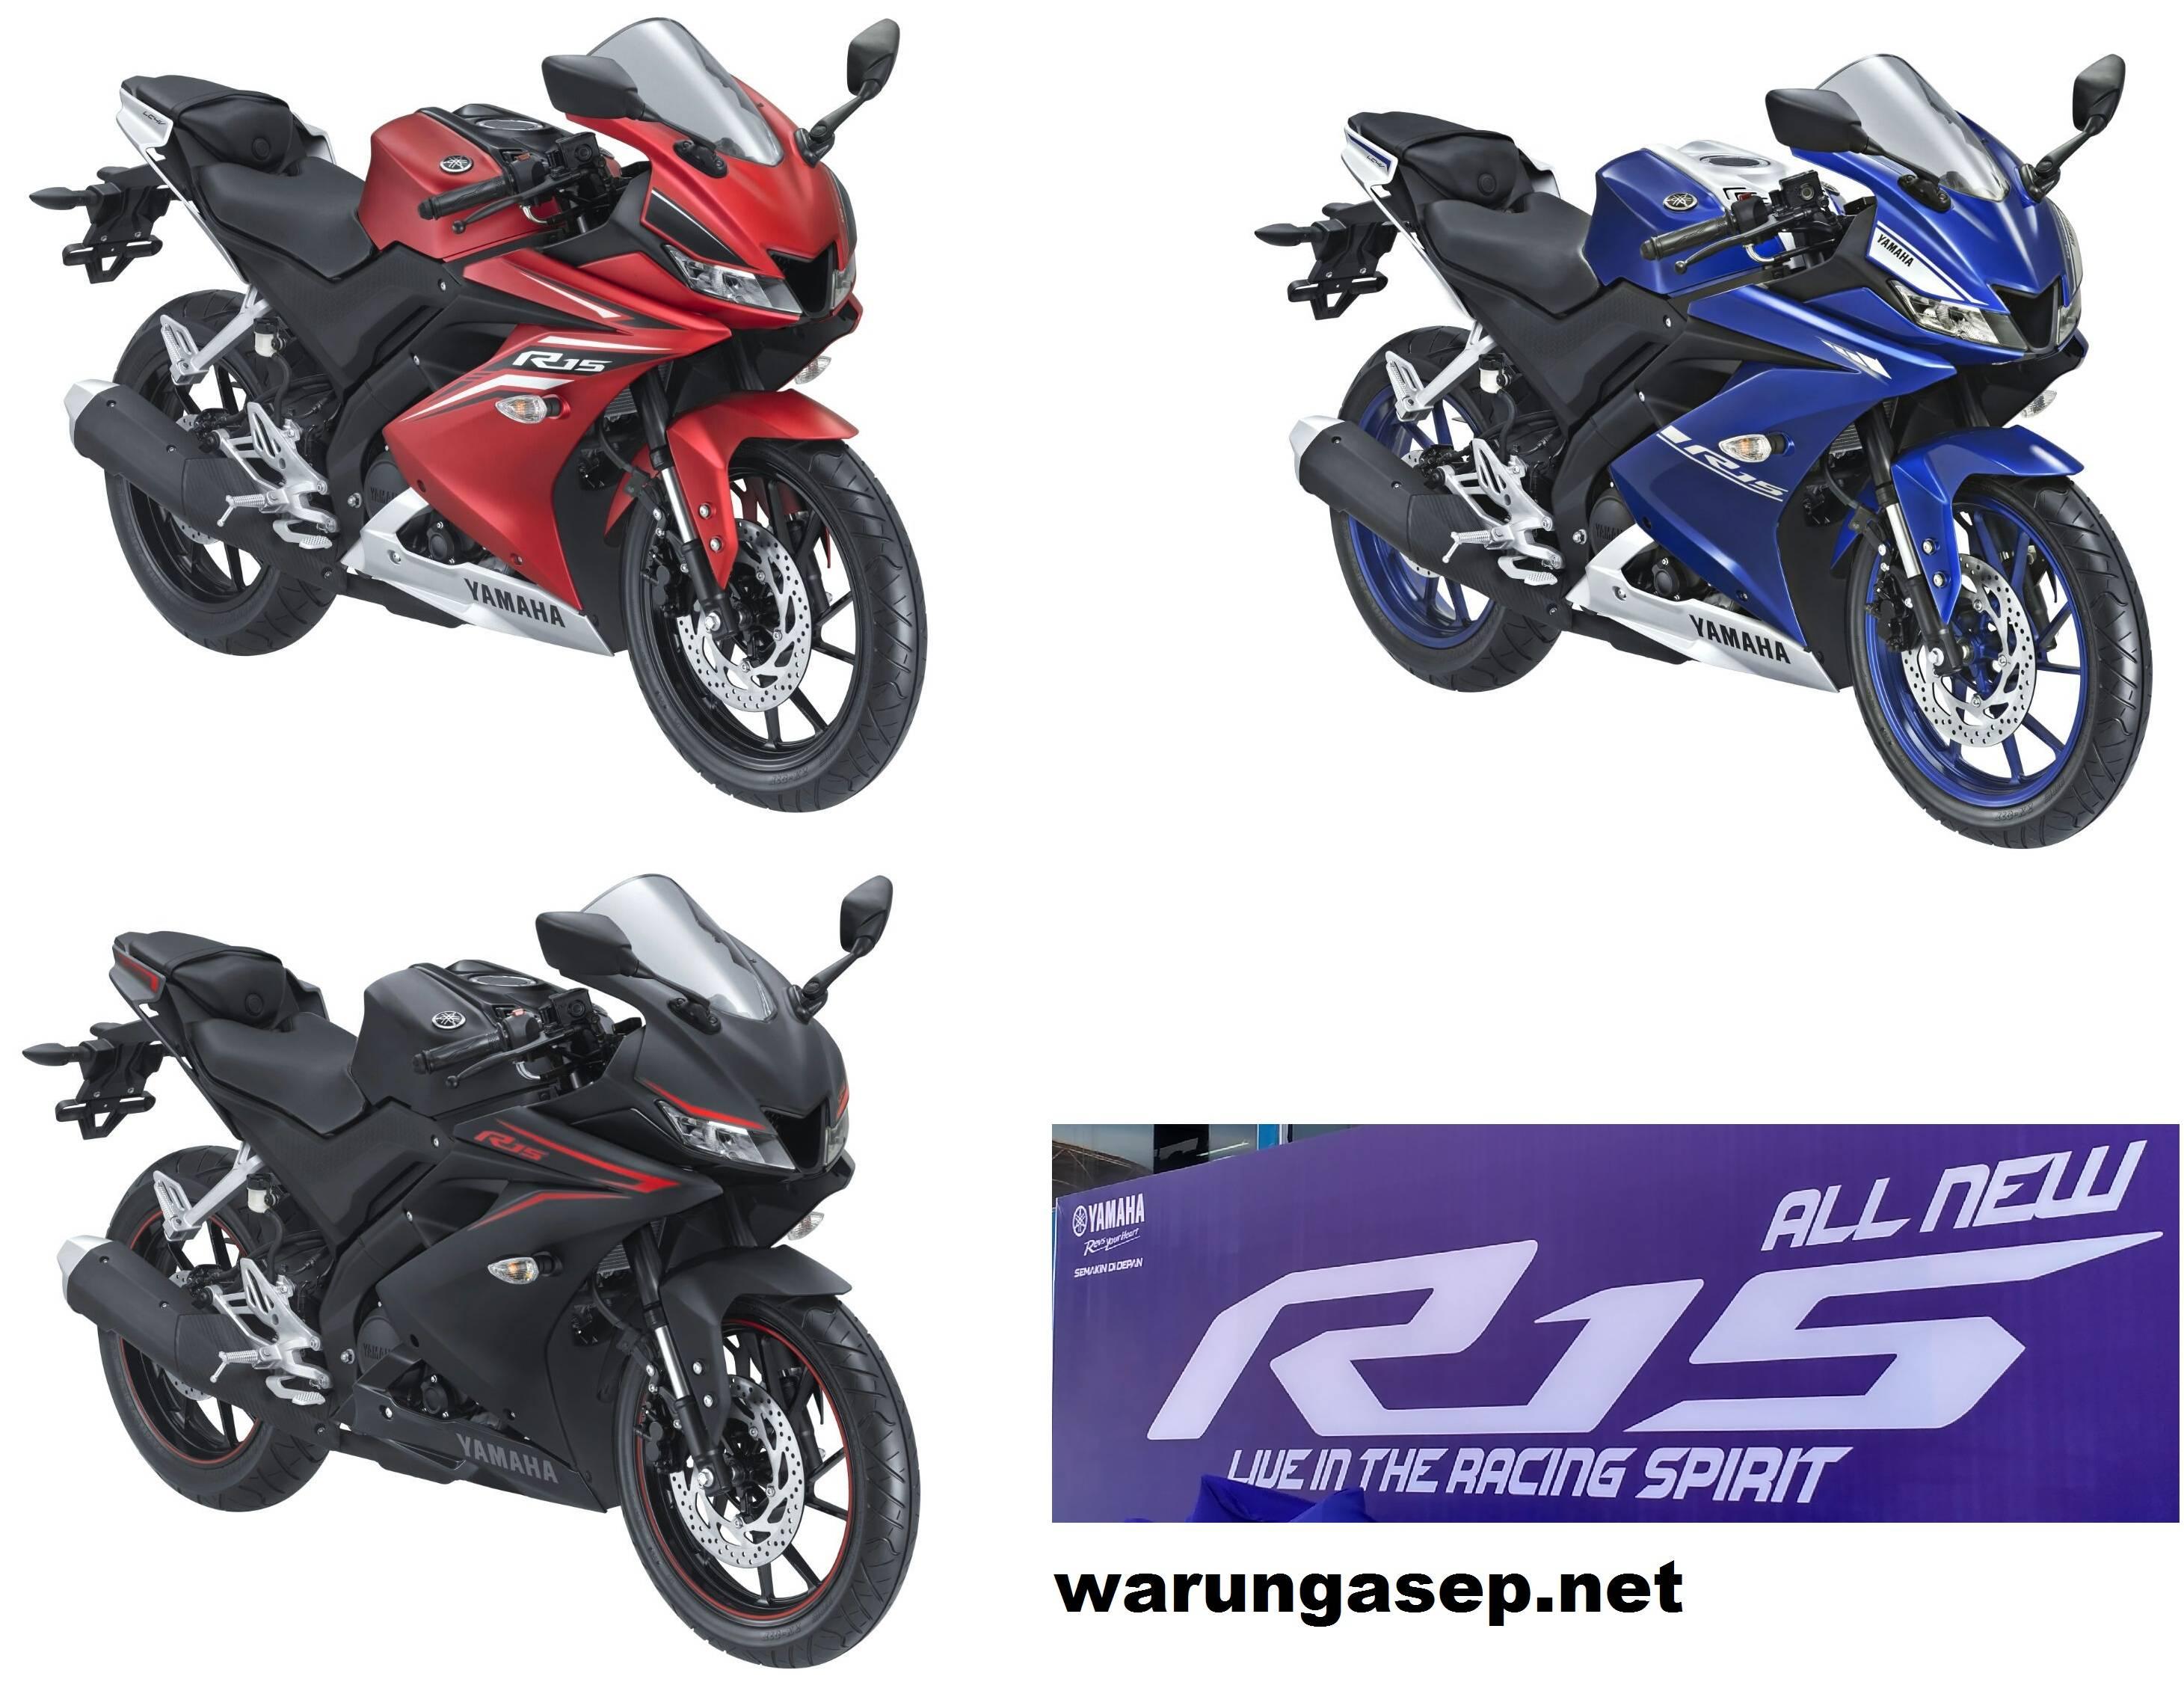 Gambar Motor Yamaha All New R15 2019 Galeriotto